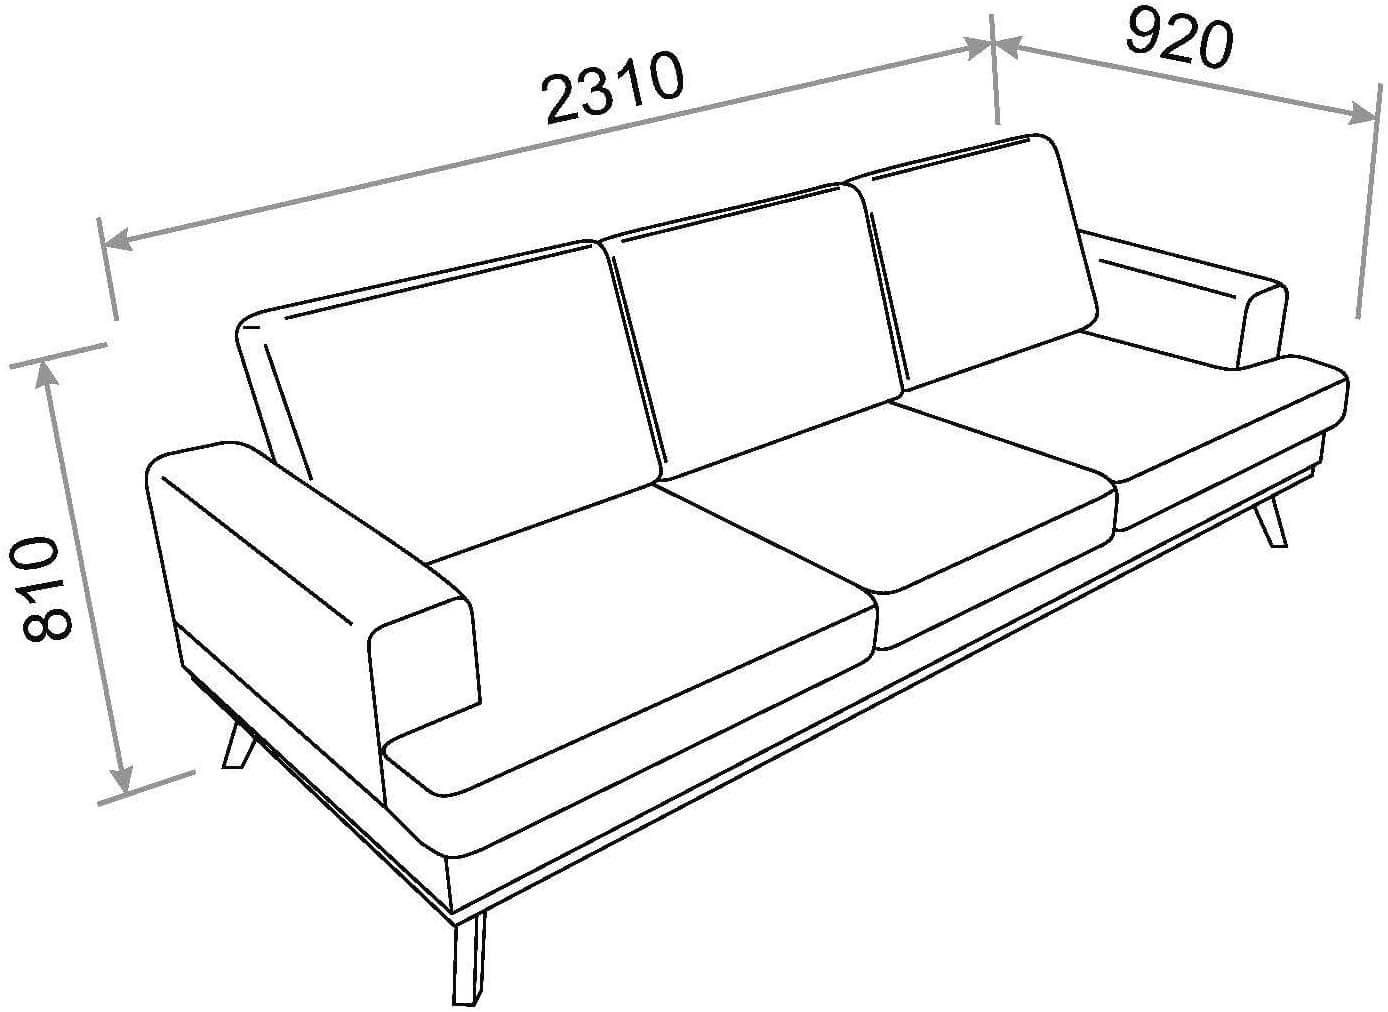 Sofa de 3 plazas Movian Rotsee medidas